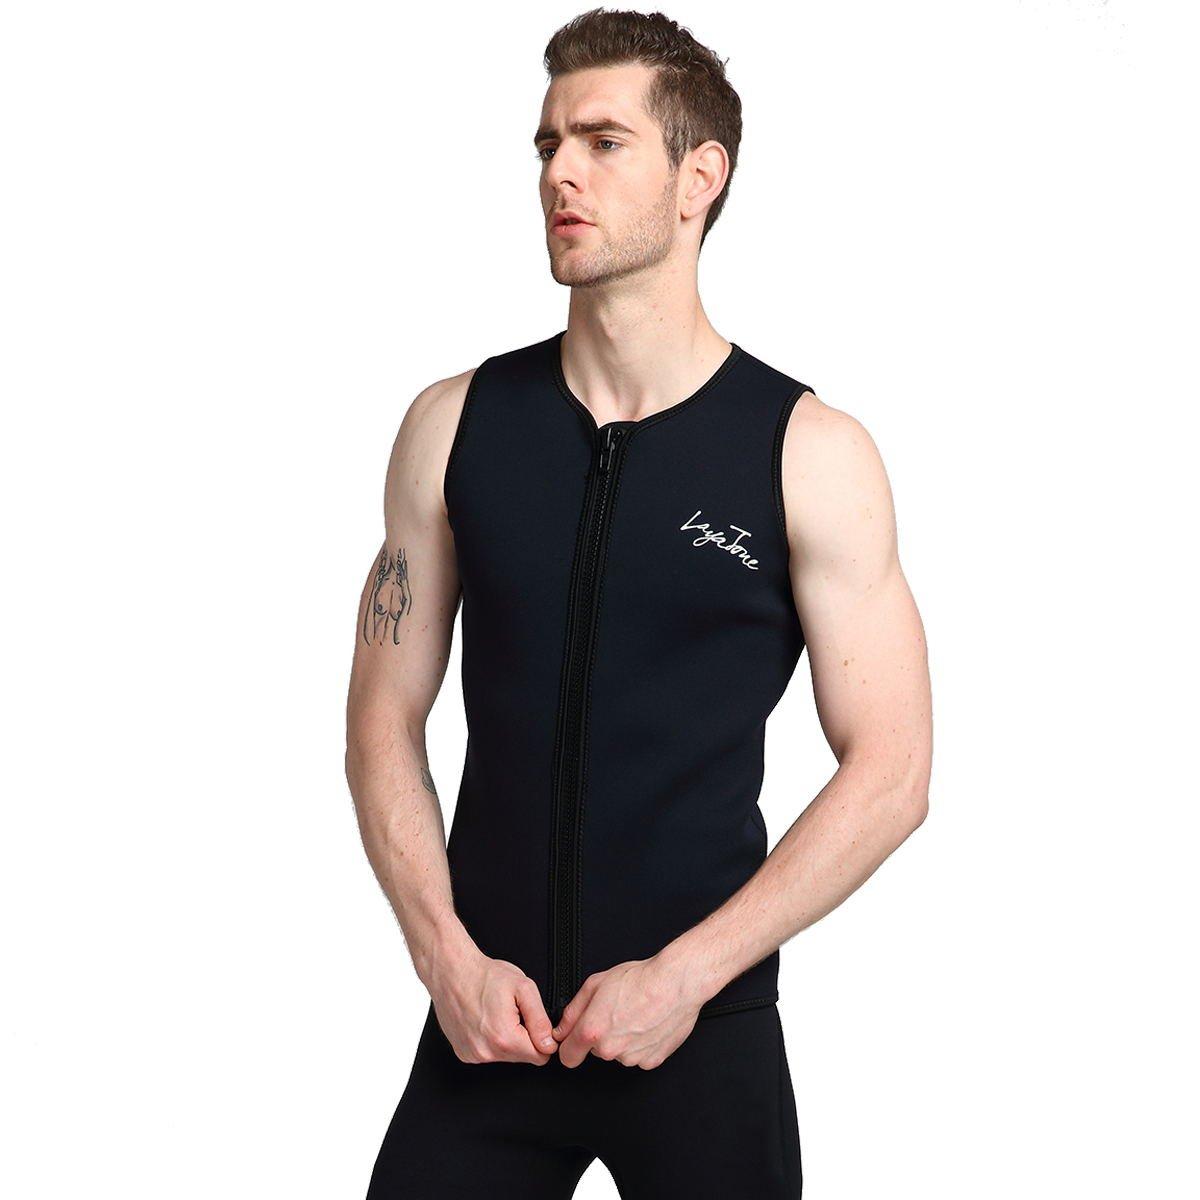 722b486785 Layatone Wetsuit Vest for Men Premium Neoprene 3mm Sleeveless Wetsuits  Diving Vest Surfing Suit Snorkeling Scuba Diving Black Wetsuit for Women Men   ...